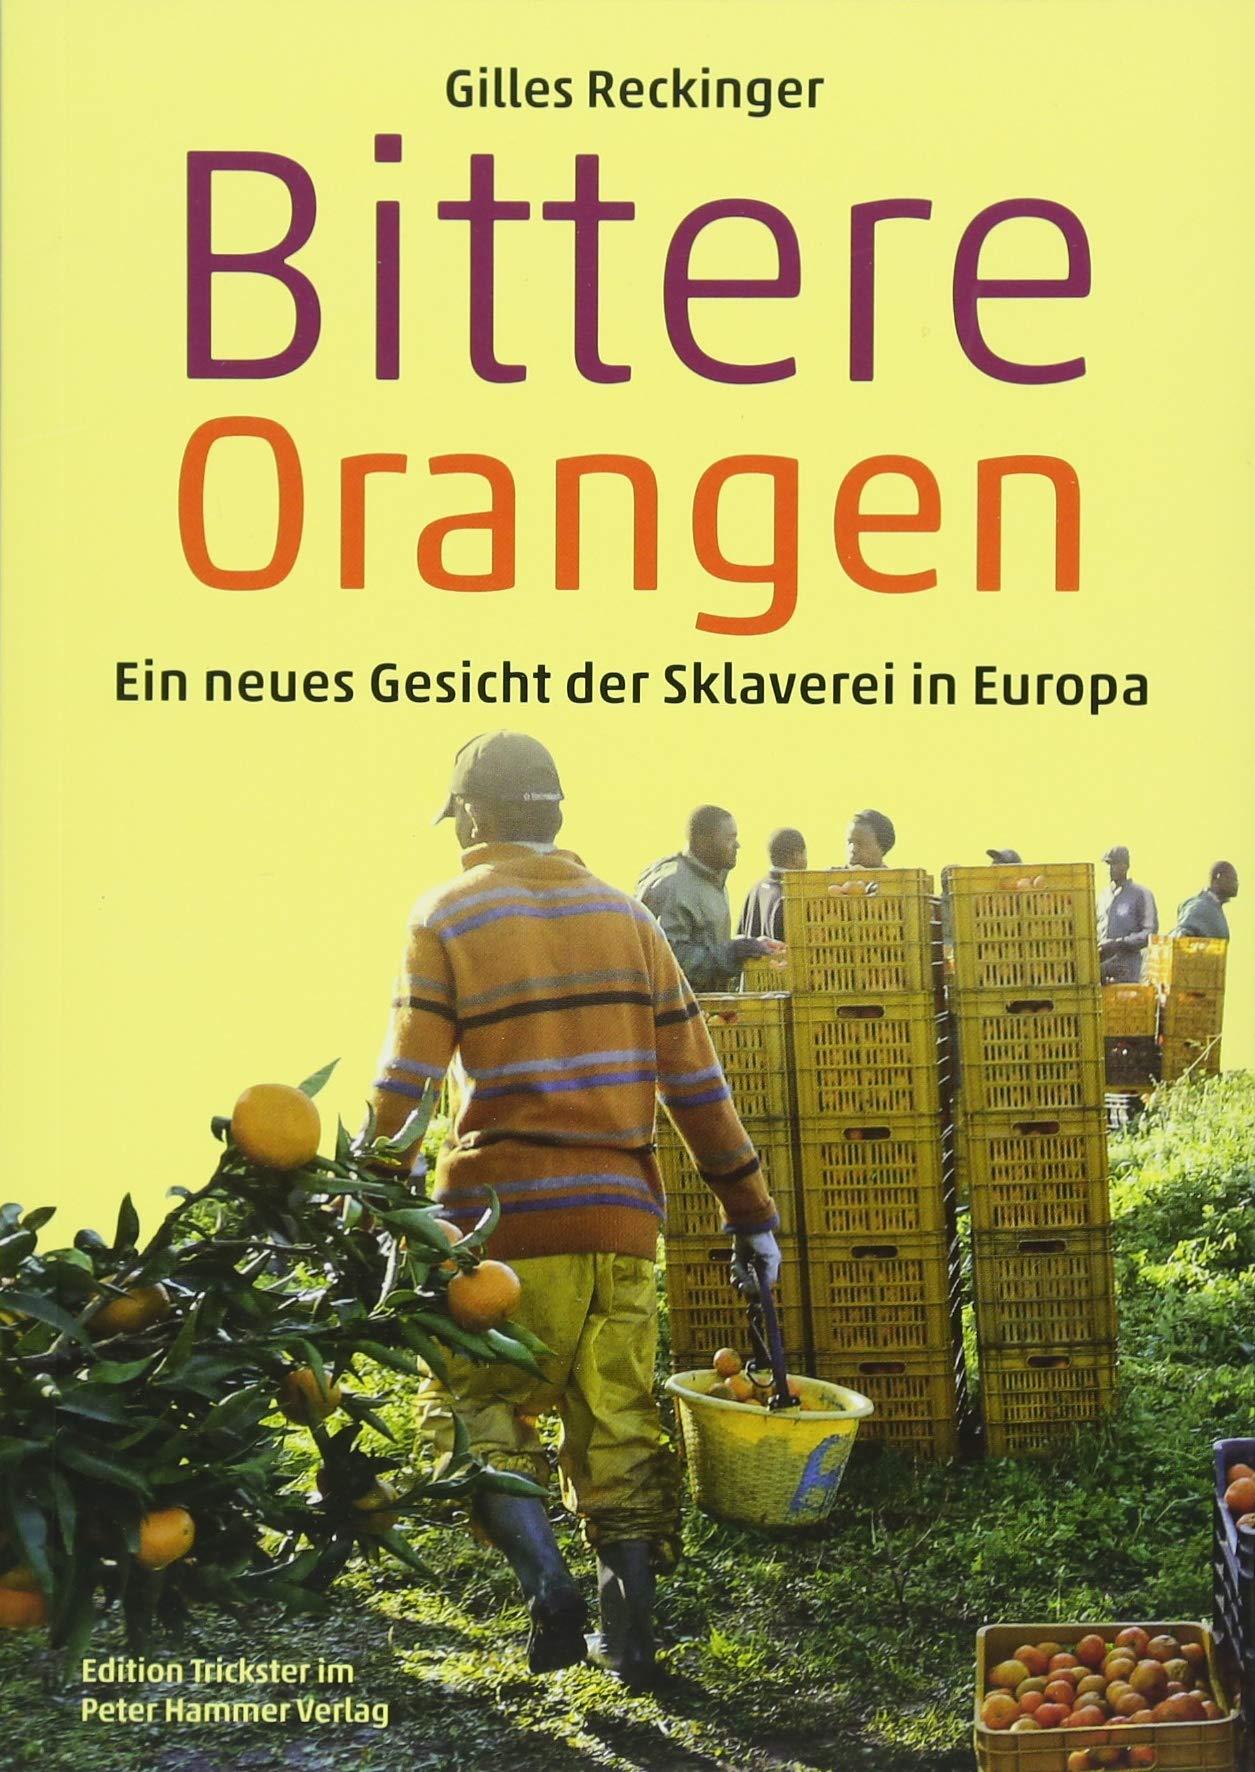 Bittere Orangen